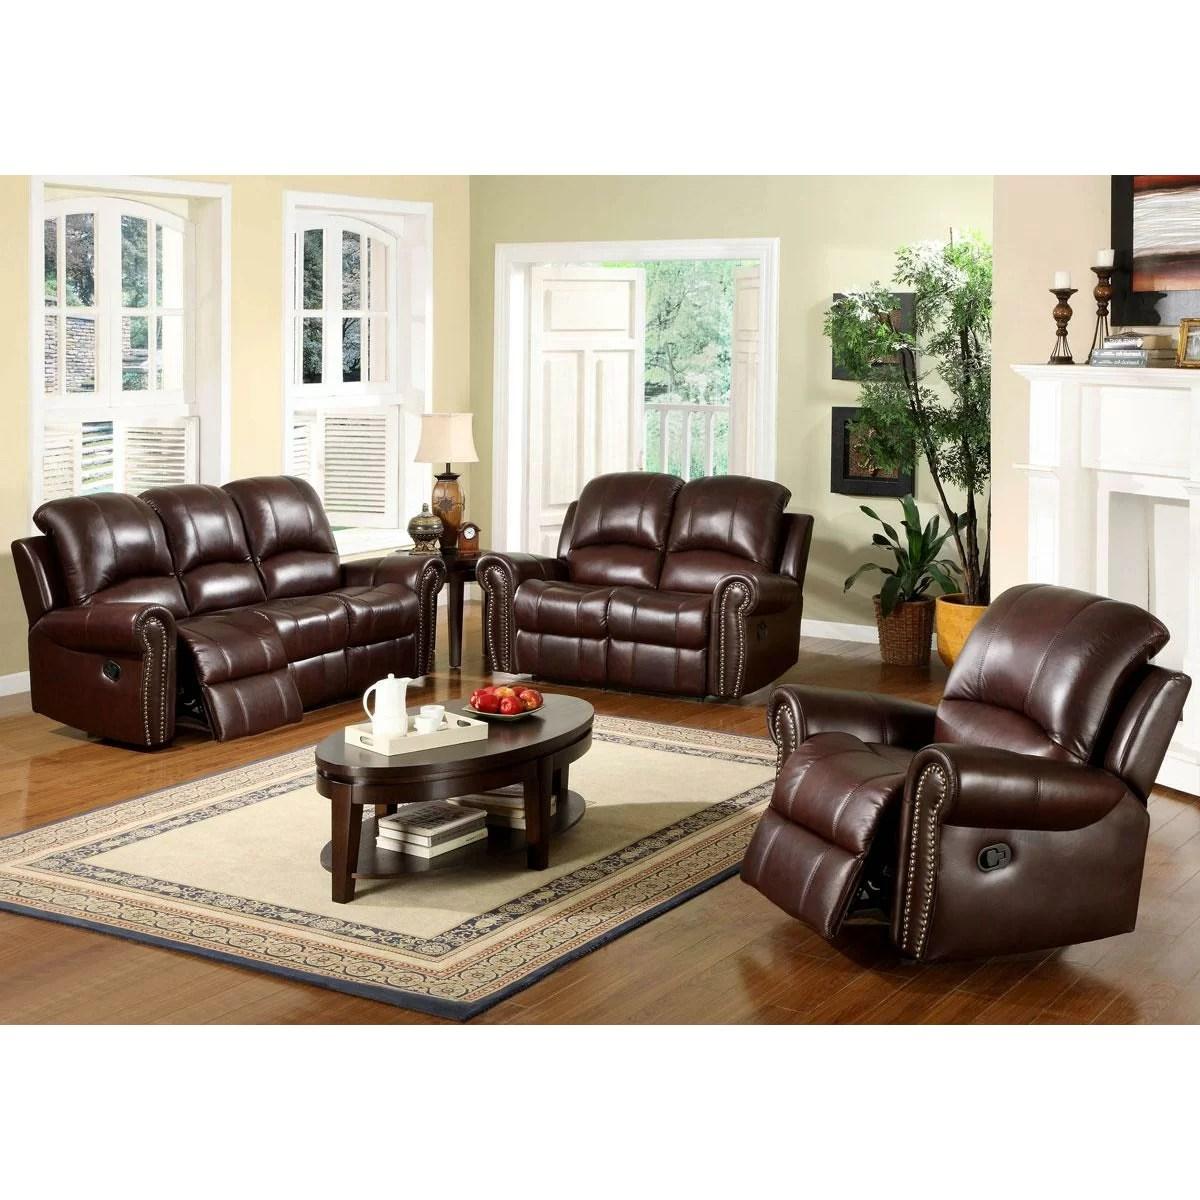 abbyson leather sofa reviews broyhill tribeca living sedona reclining loveseat and